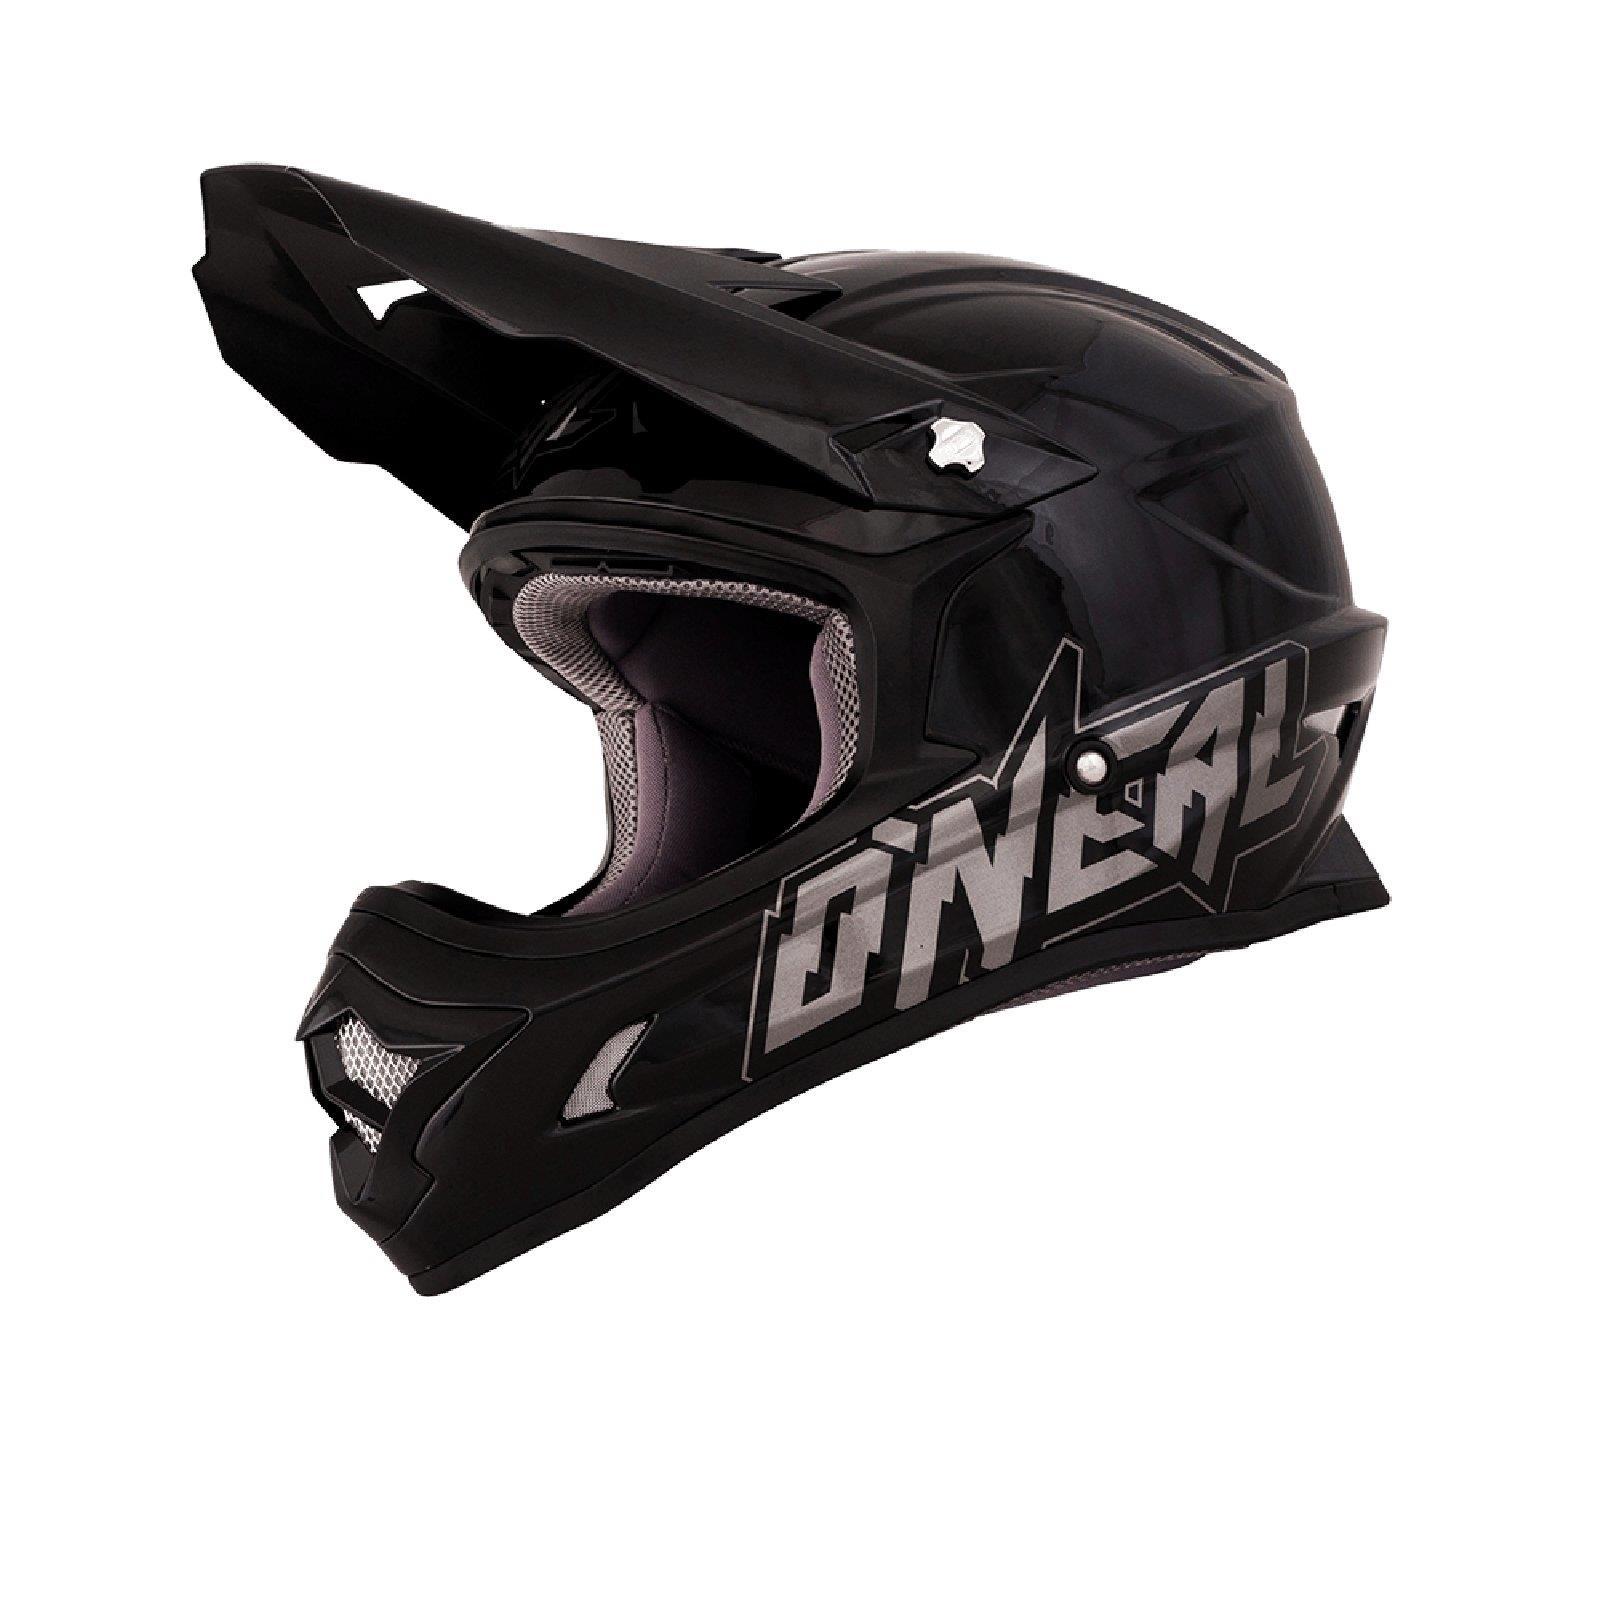 ONeal-3Series-MX-Helm-schwarz-Cross-Motorrad-Motocross-Enduro-Offroad-Quad-ATV